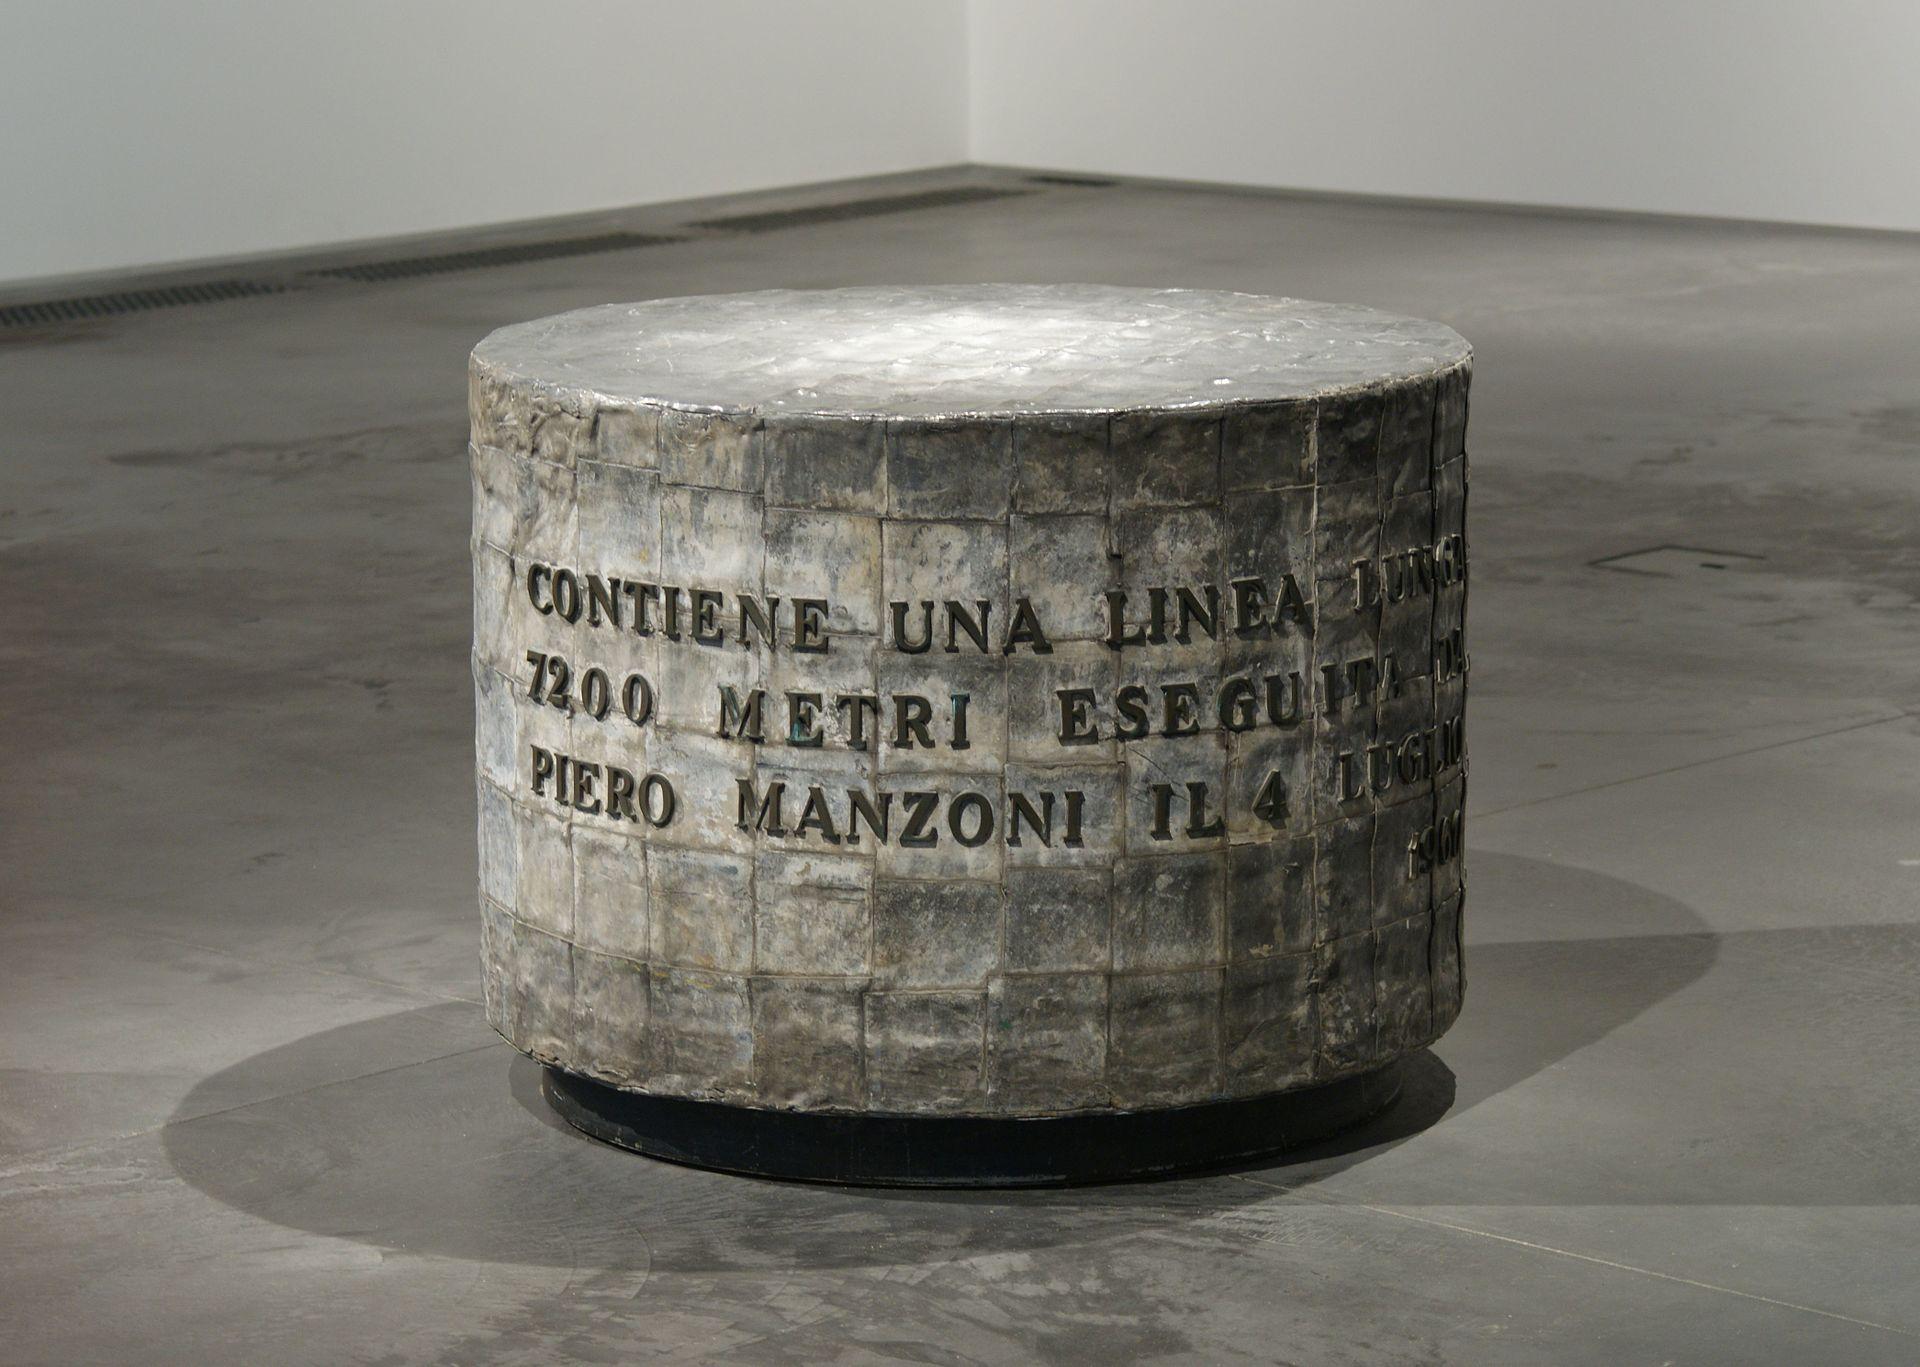 Piero Manzoni - Die Lange Linie (7.200 Meter)